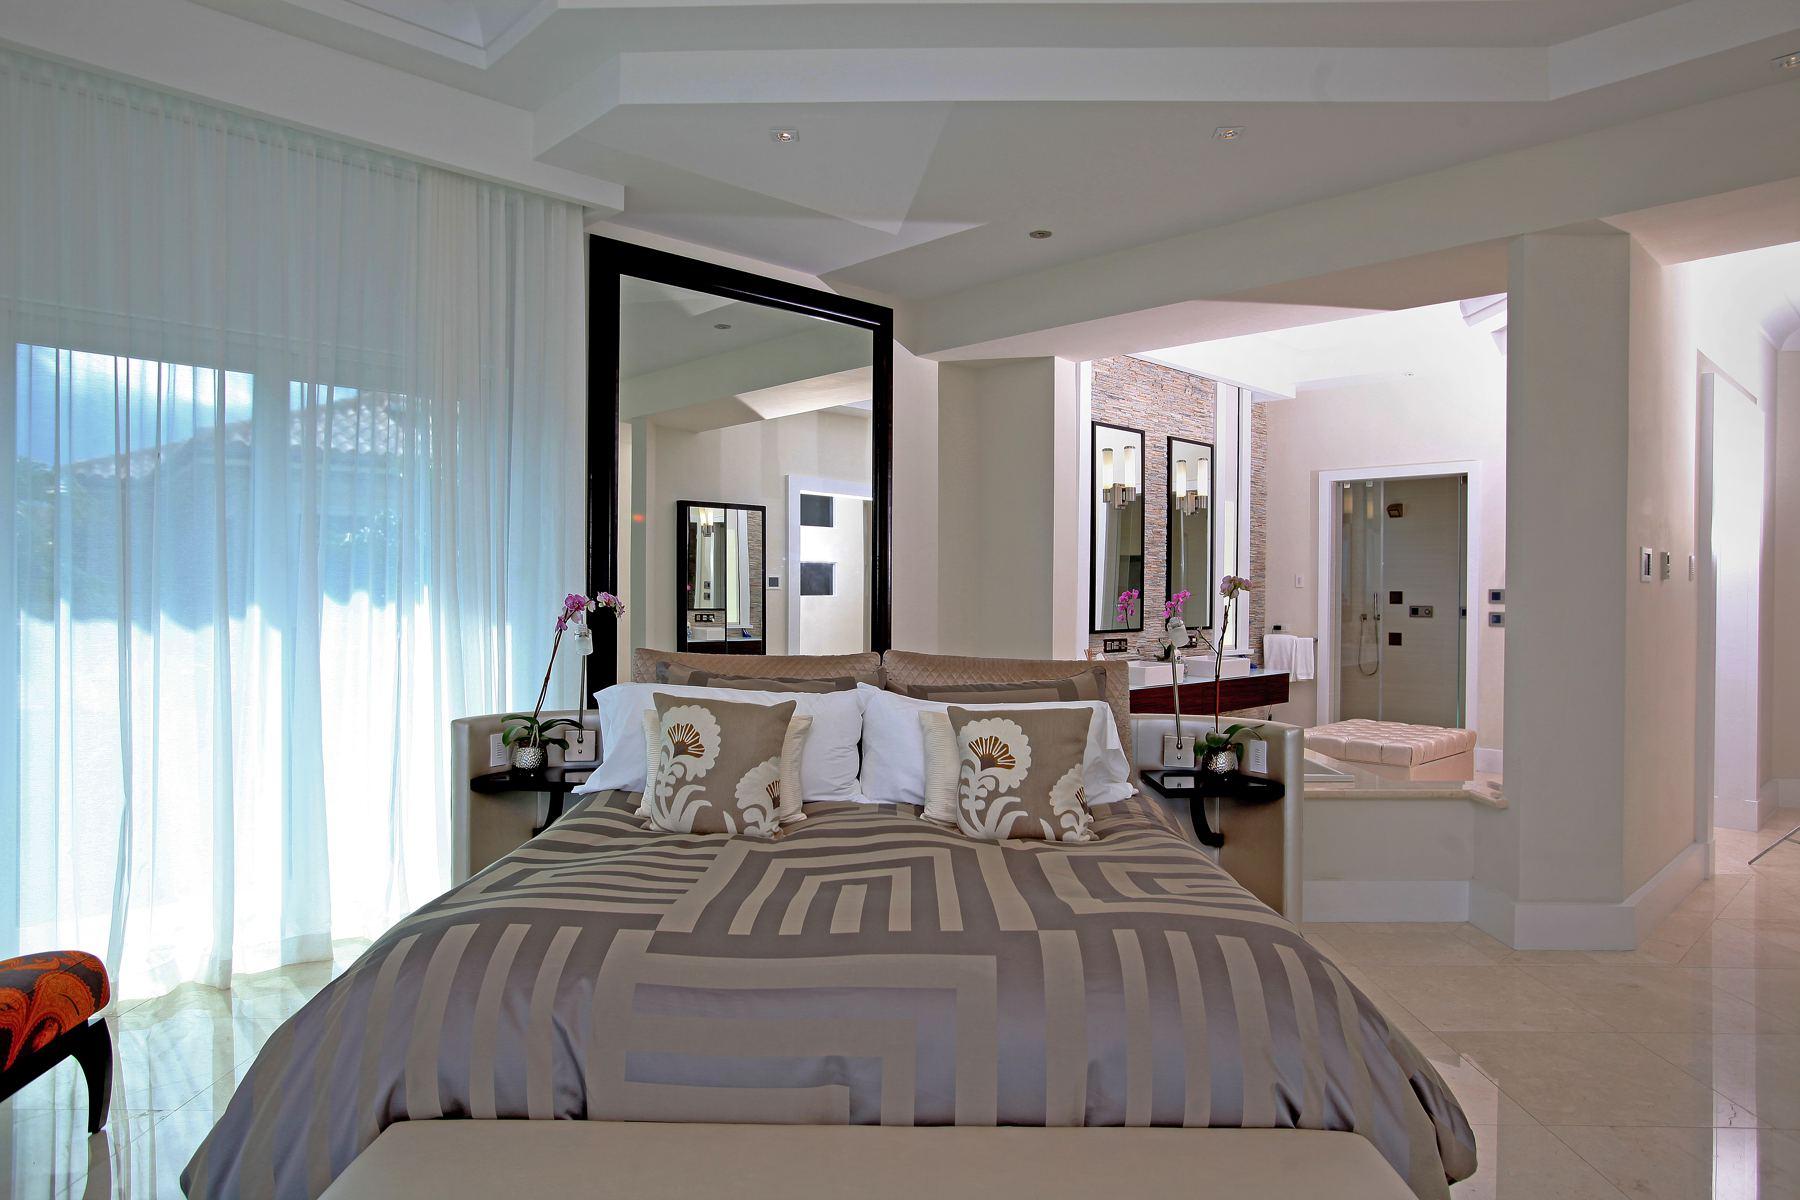 Additional photo for property listing at Ocean Club Estates #38 Ocean Club Estates, Paradise Island, New Providence/Nassau Bahamas